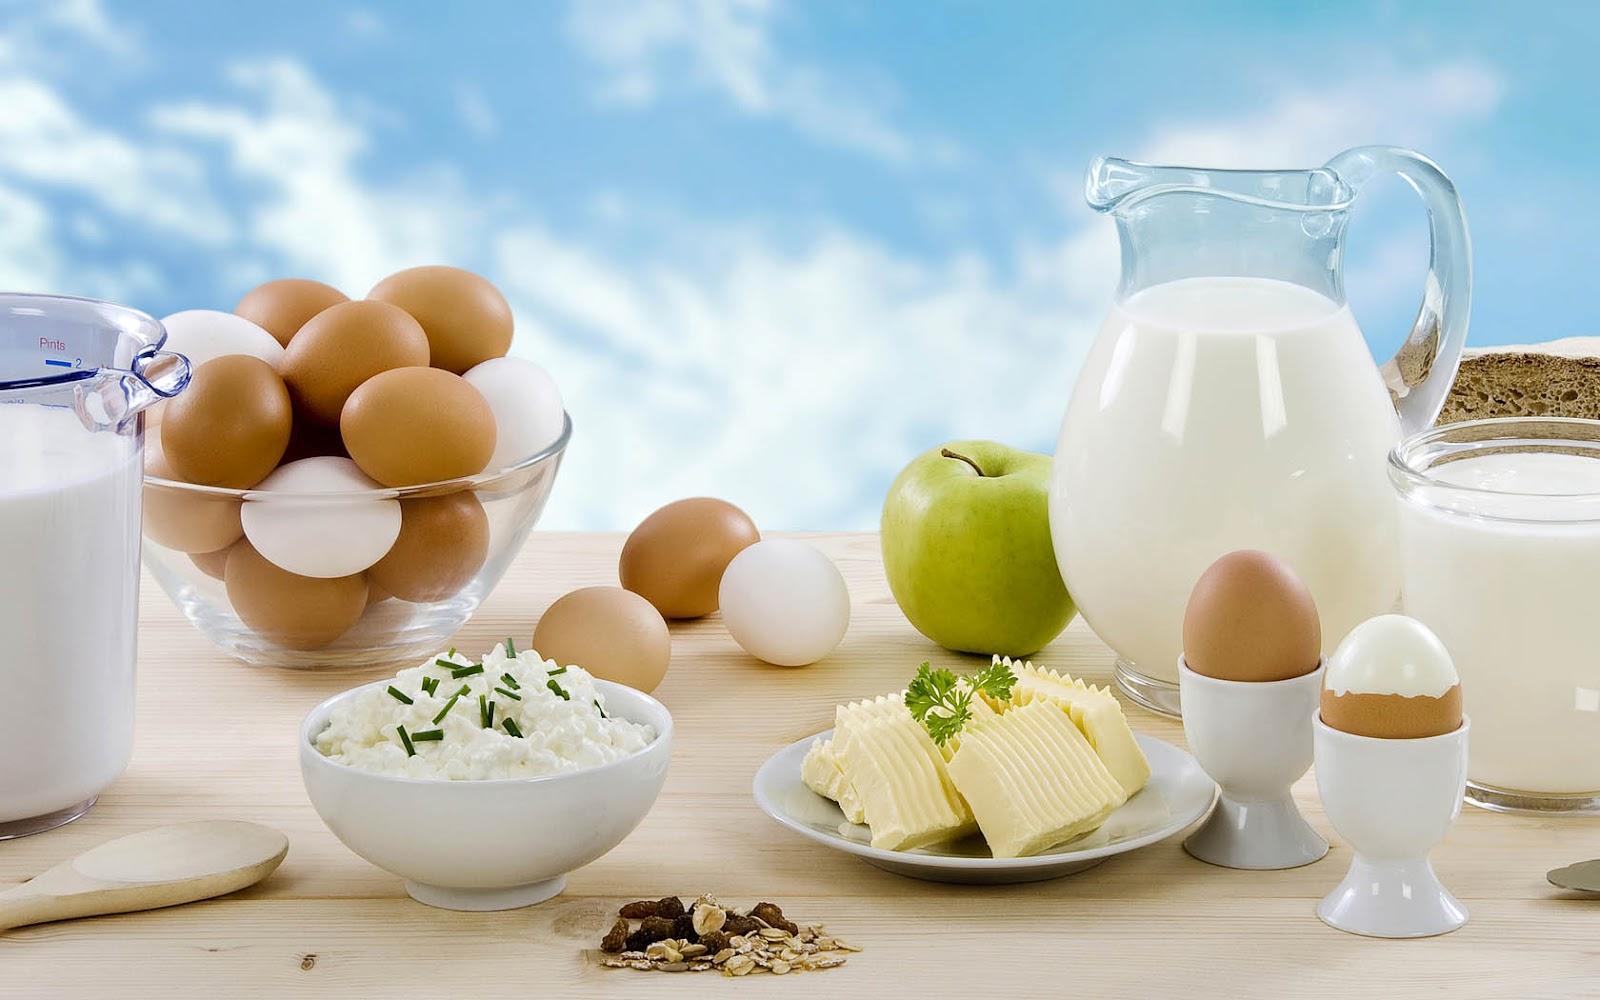 http://3.bp.blogspot.com/-S4LJWZmlL88/UHCS1T2-p3I/AAAAAAAAFqY/d8xZZuIGHXQ/s1600/wallpaper-met-melk-en-eieren-op-tafel-hd-eten-achtergrond.jpg